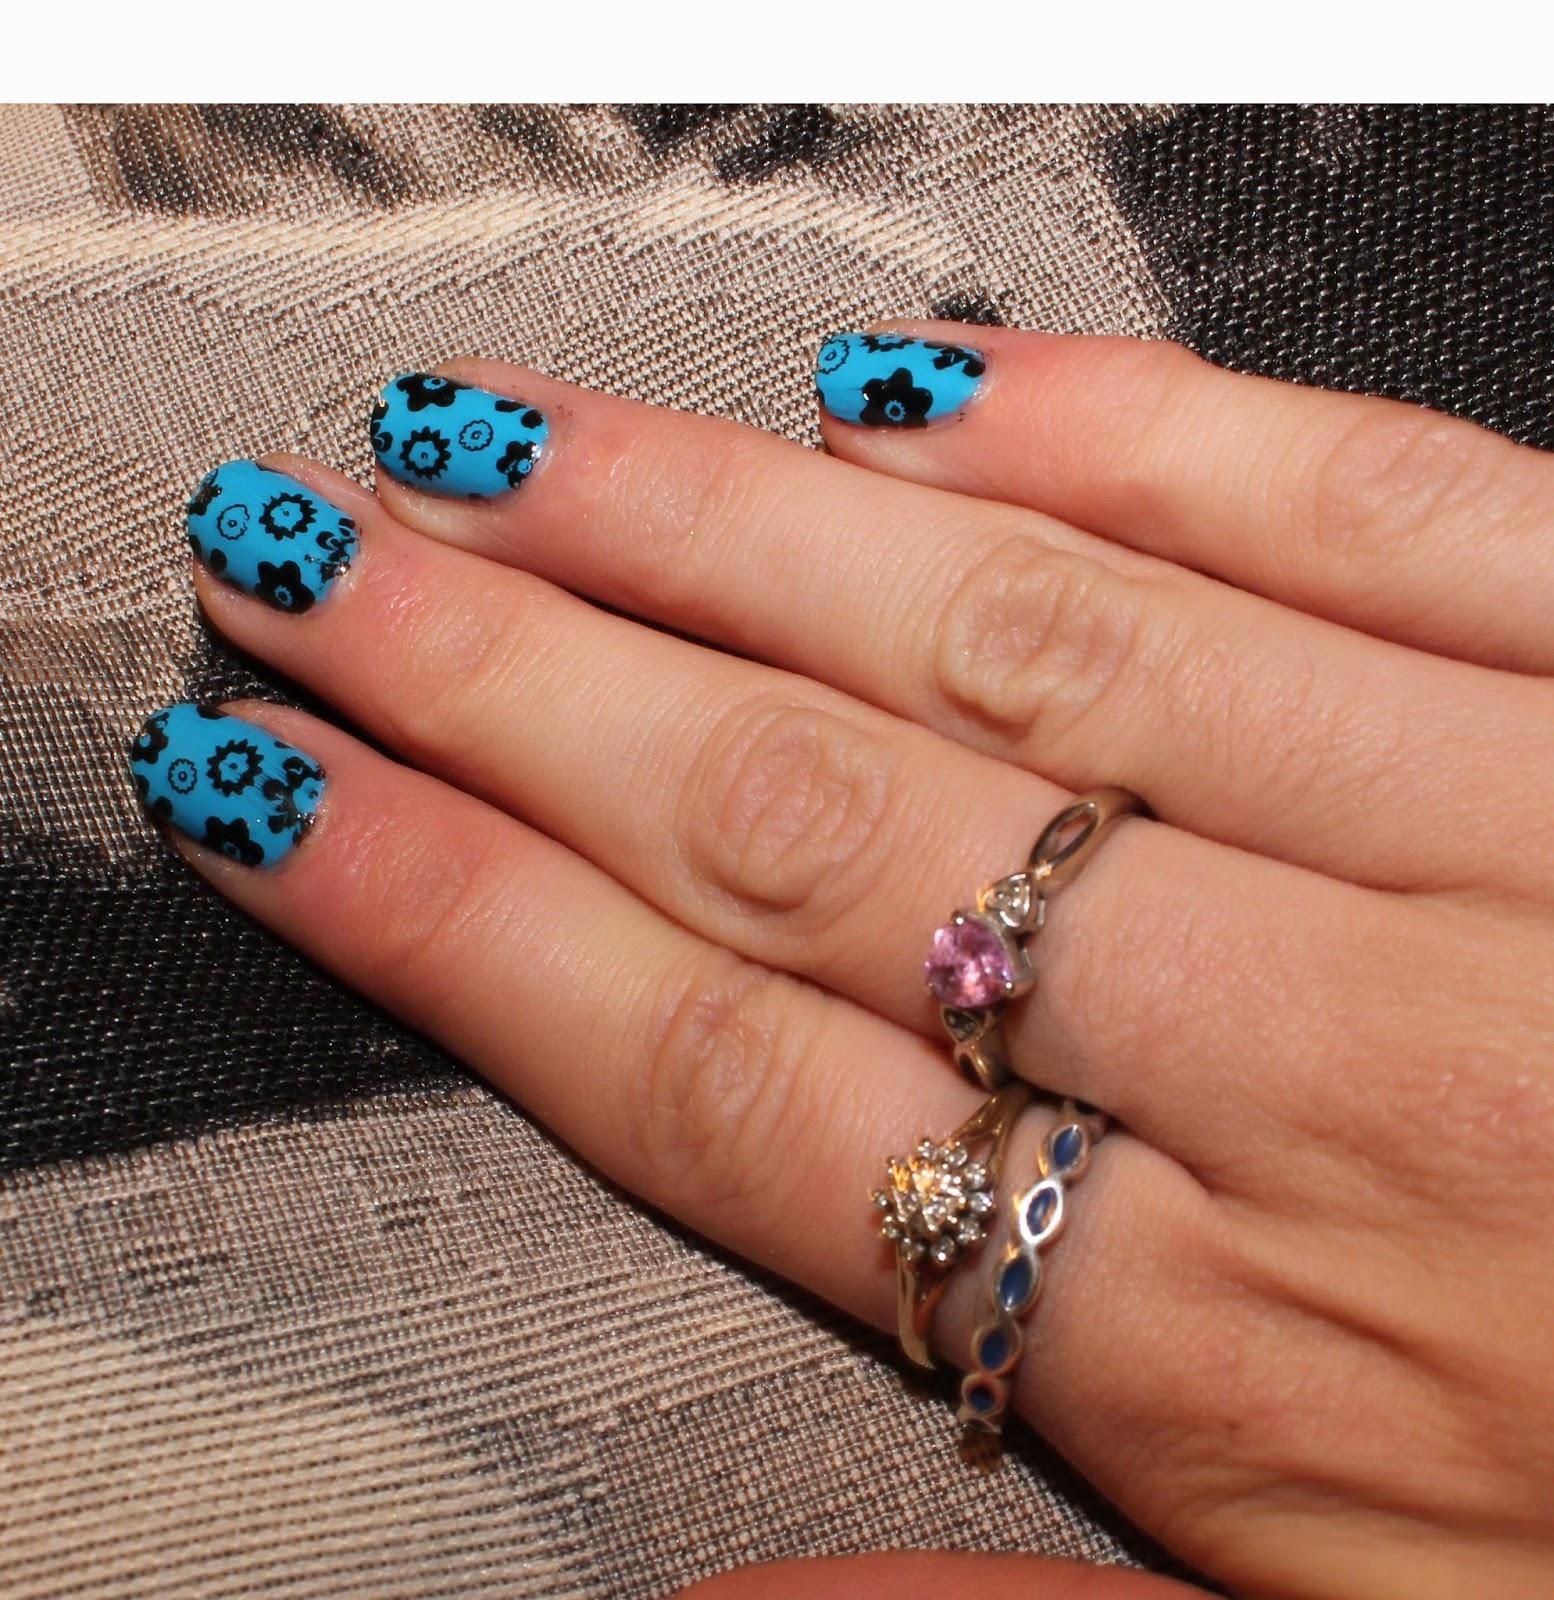 MoYou Nail Art Kit